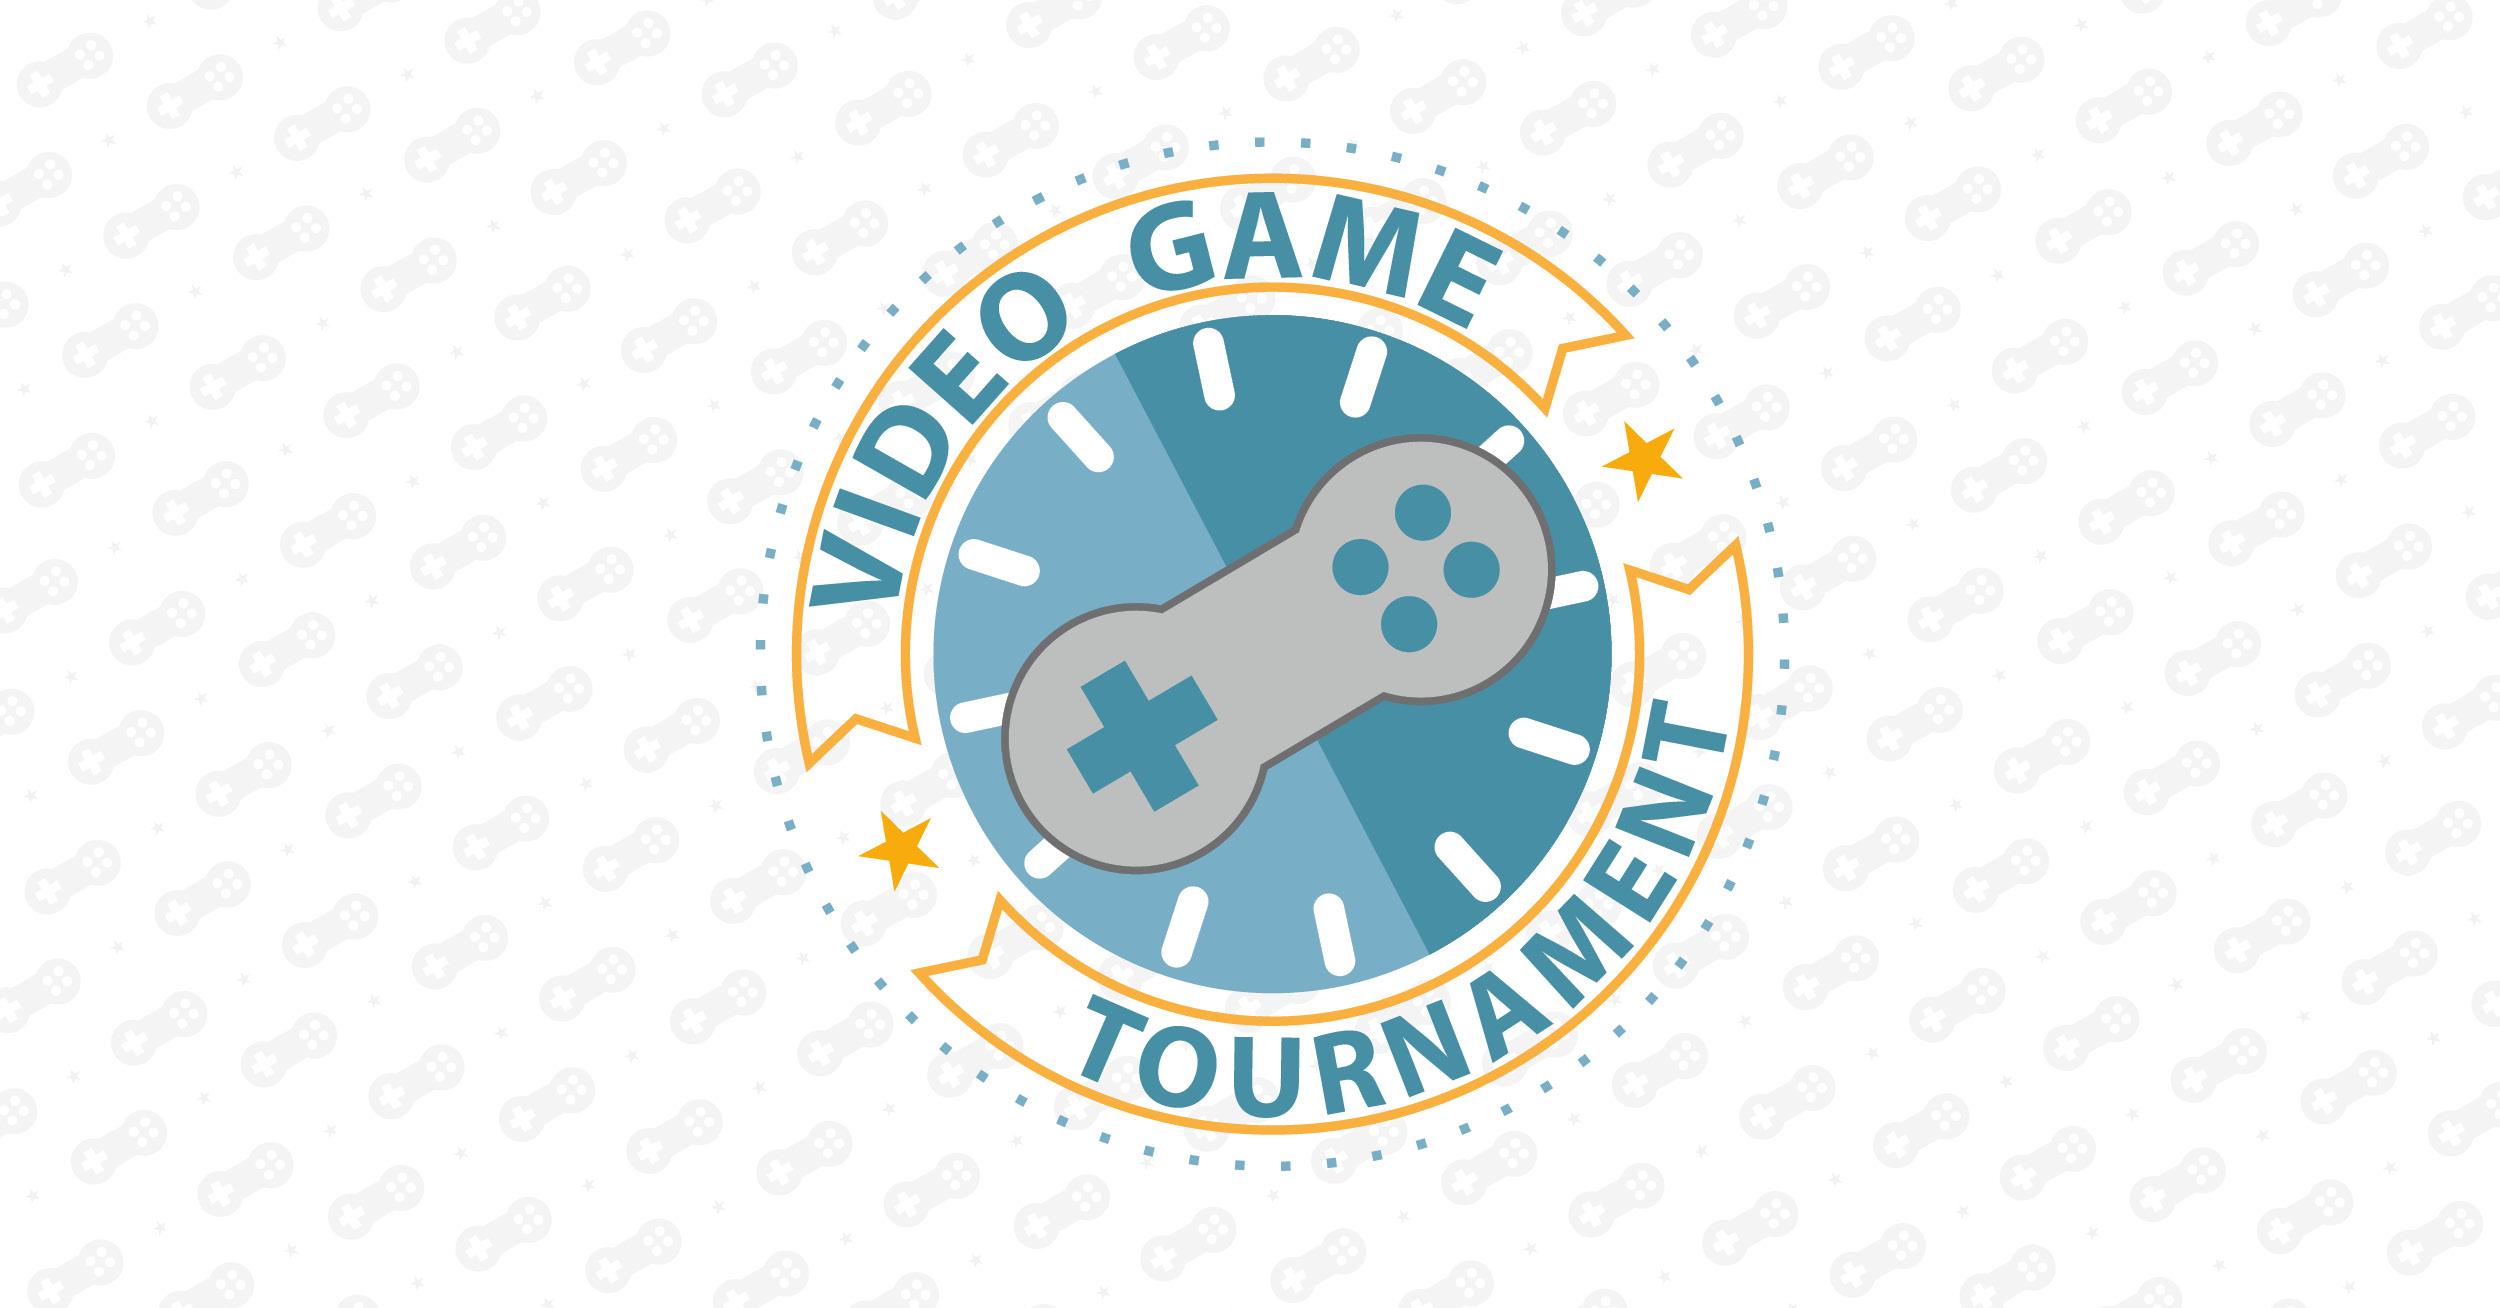 FB Video Game Tournament MA.jpg